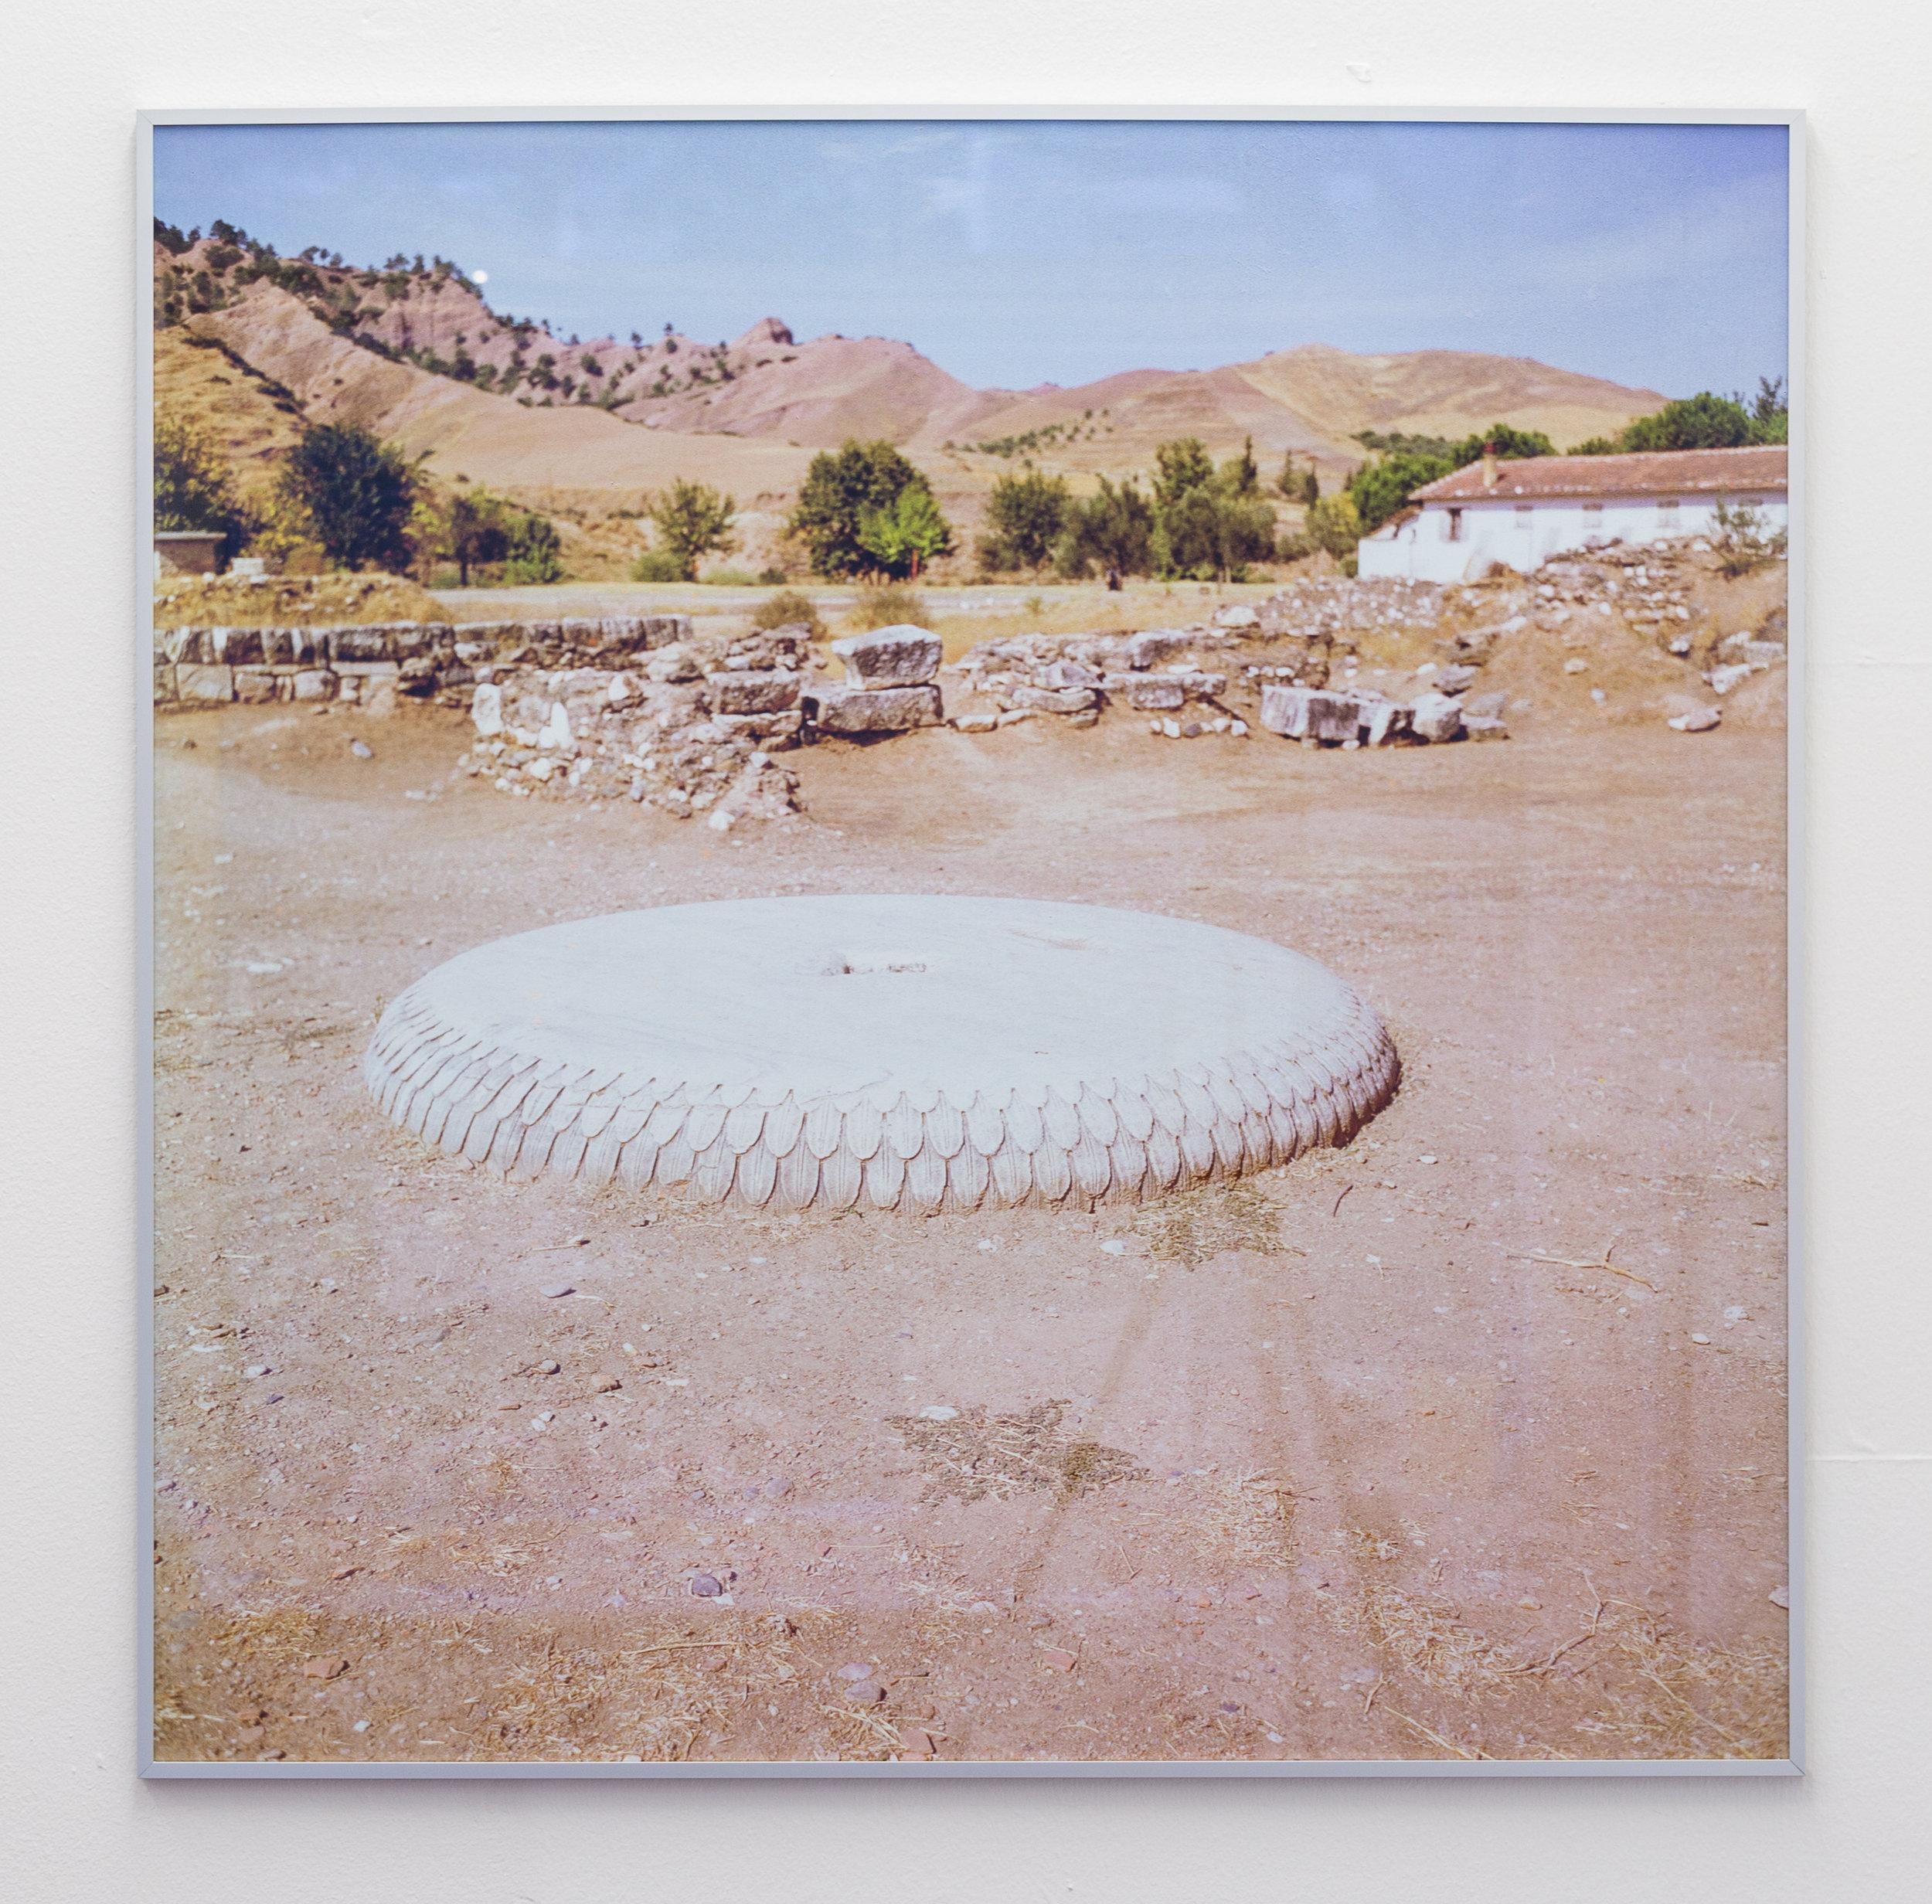 Donatella Bernardi,  Portique Syrien Series 4 , 2015, inkjet print mounted on aluminium board, 101 x 101.5 cm Photo: Kilian Bannwart